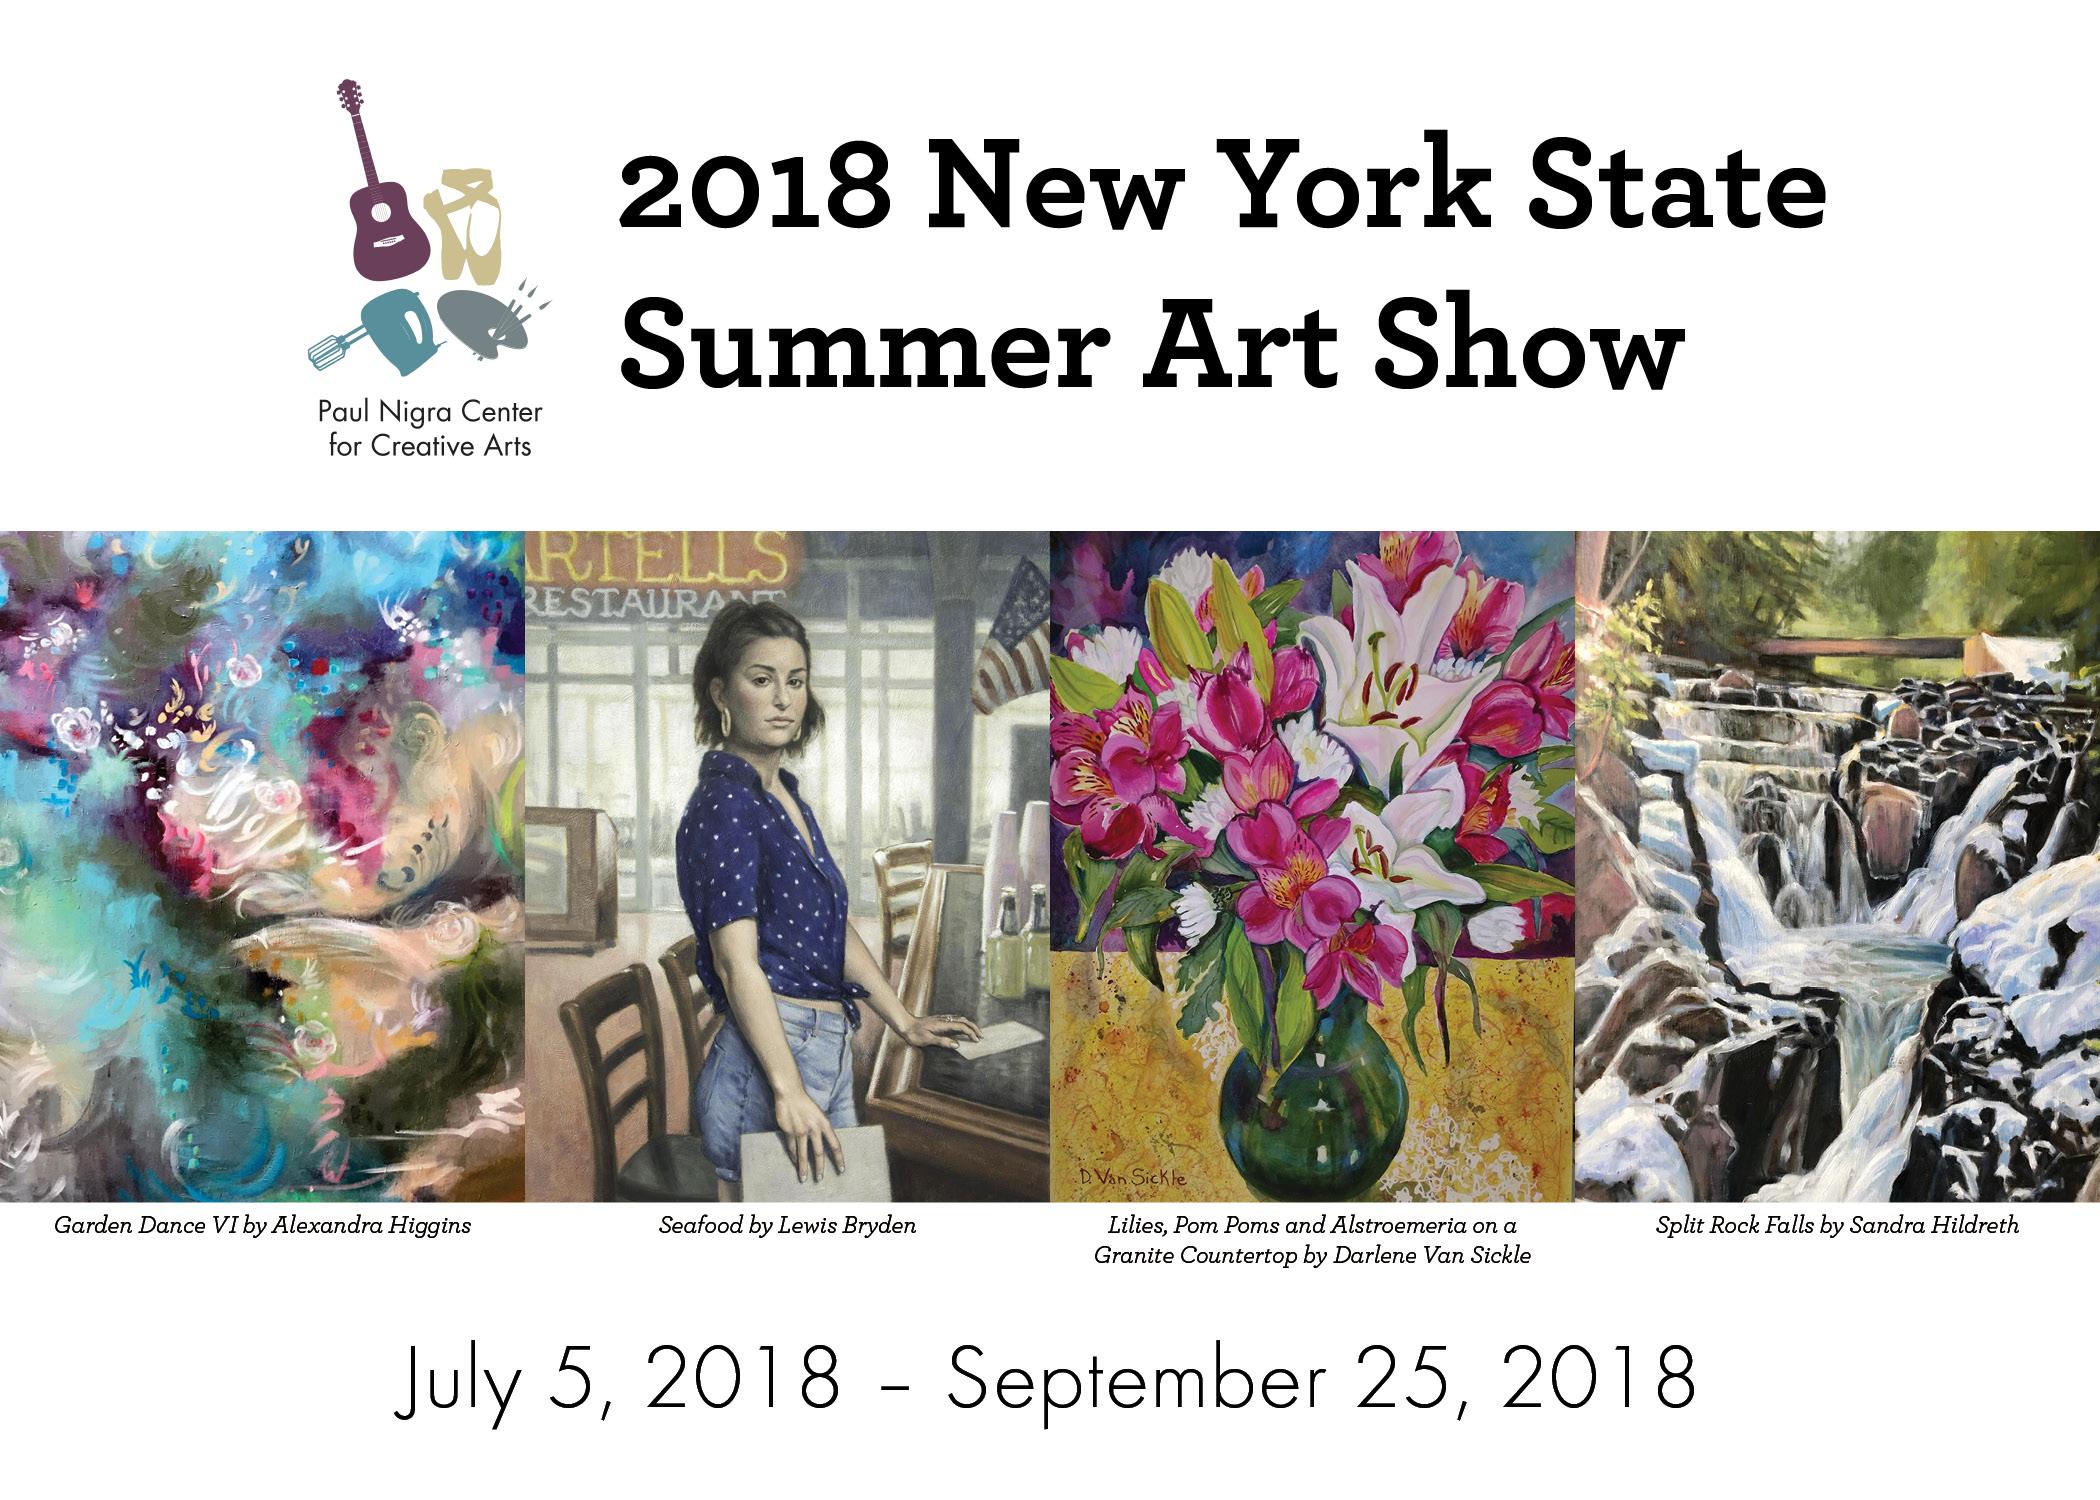 2018 New York State Summer Art Show homepage notice.jpg